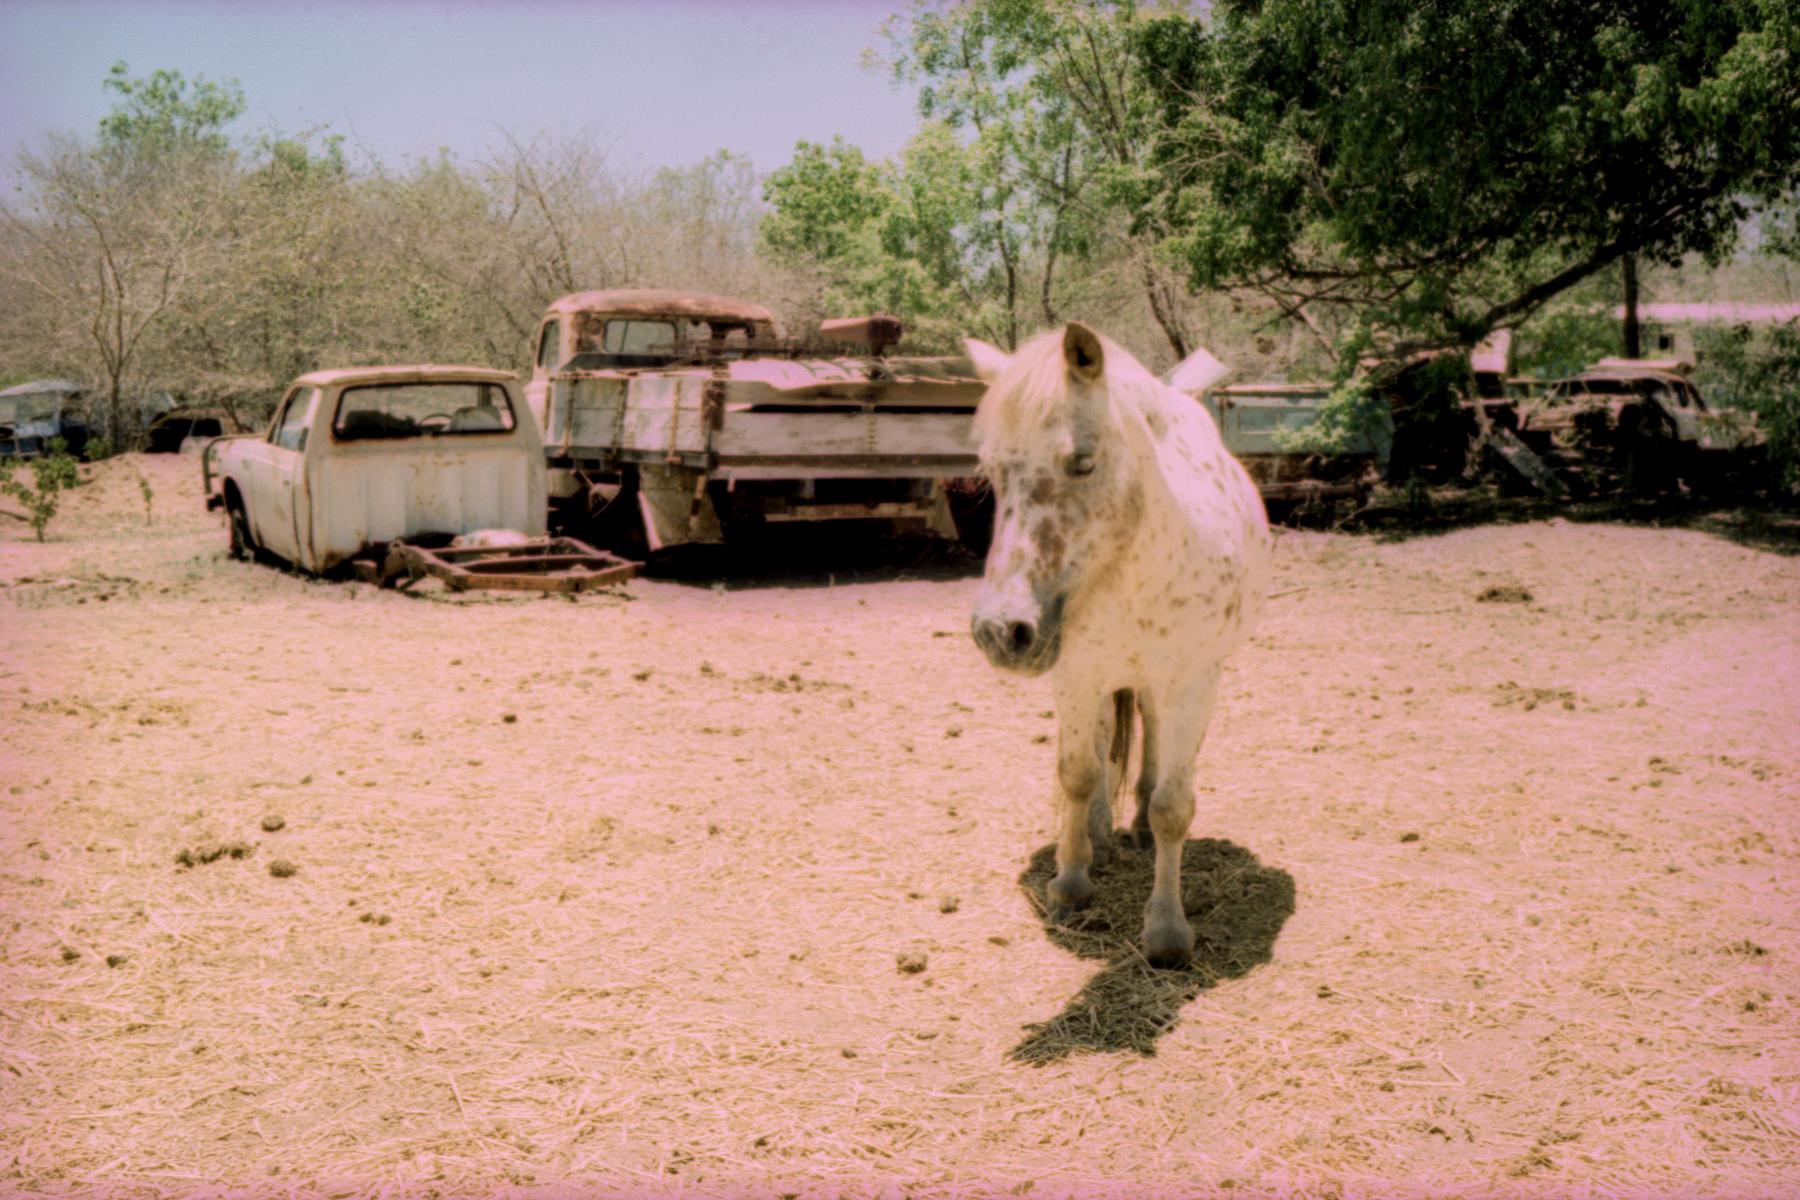 Junkyard Pony   Leica M3   E100 in C41   Greg Williamson